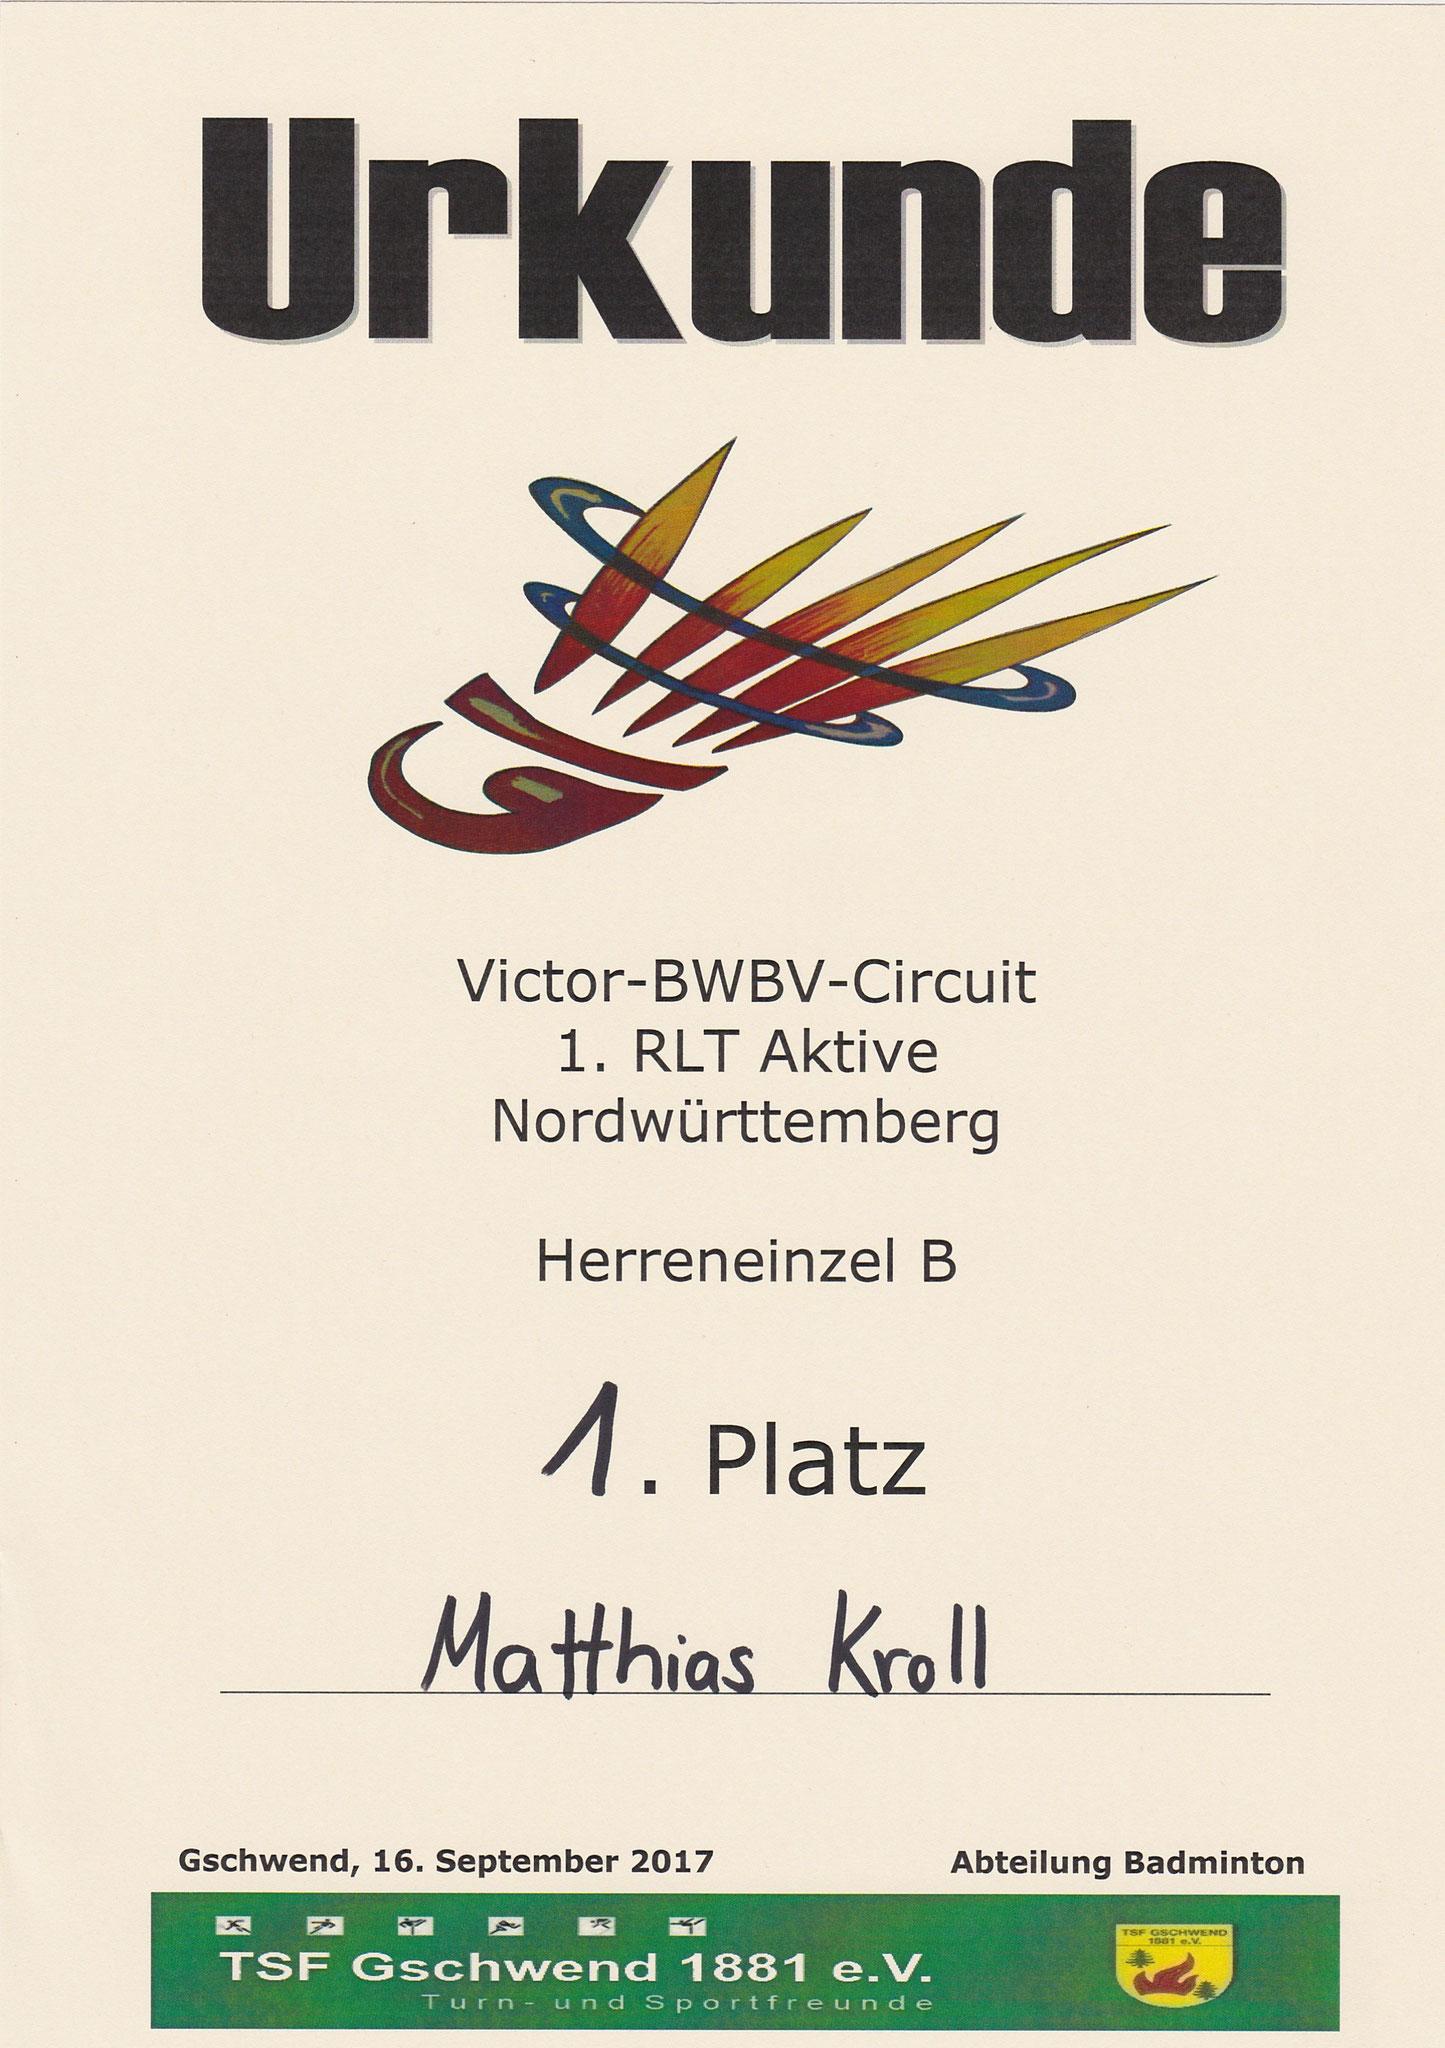 Urkunde 1. Platz Herreneinzel